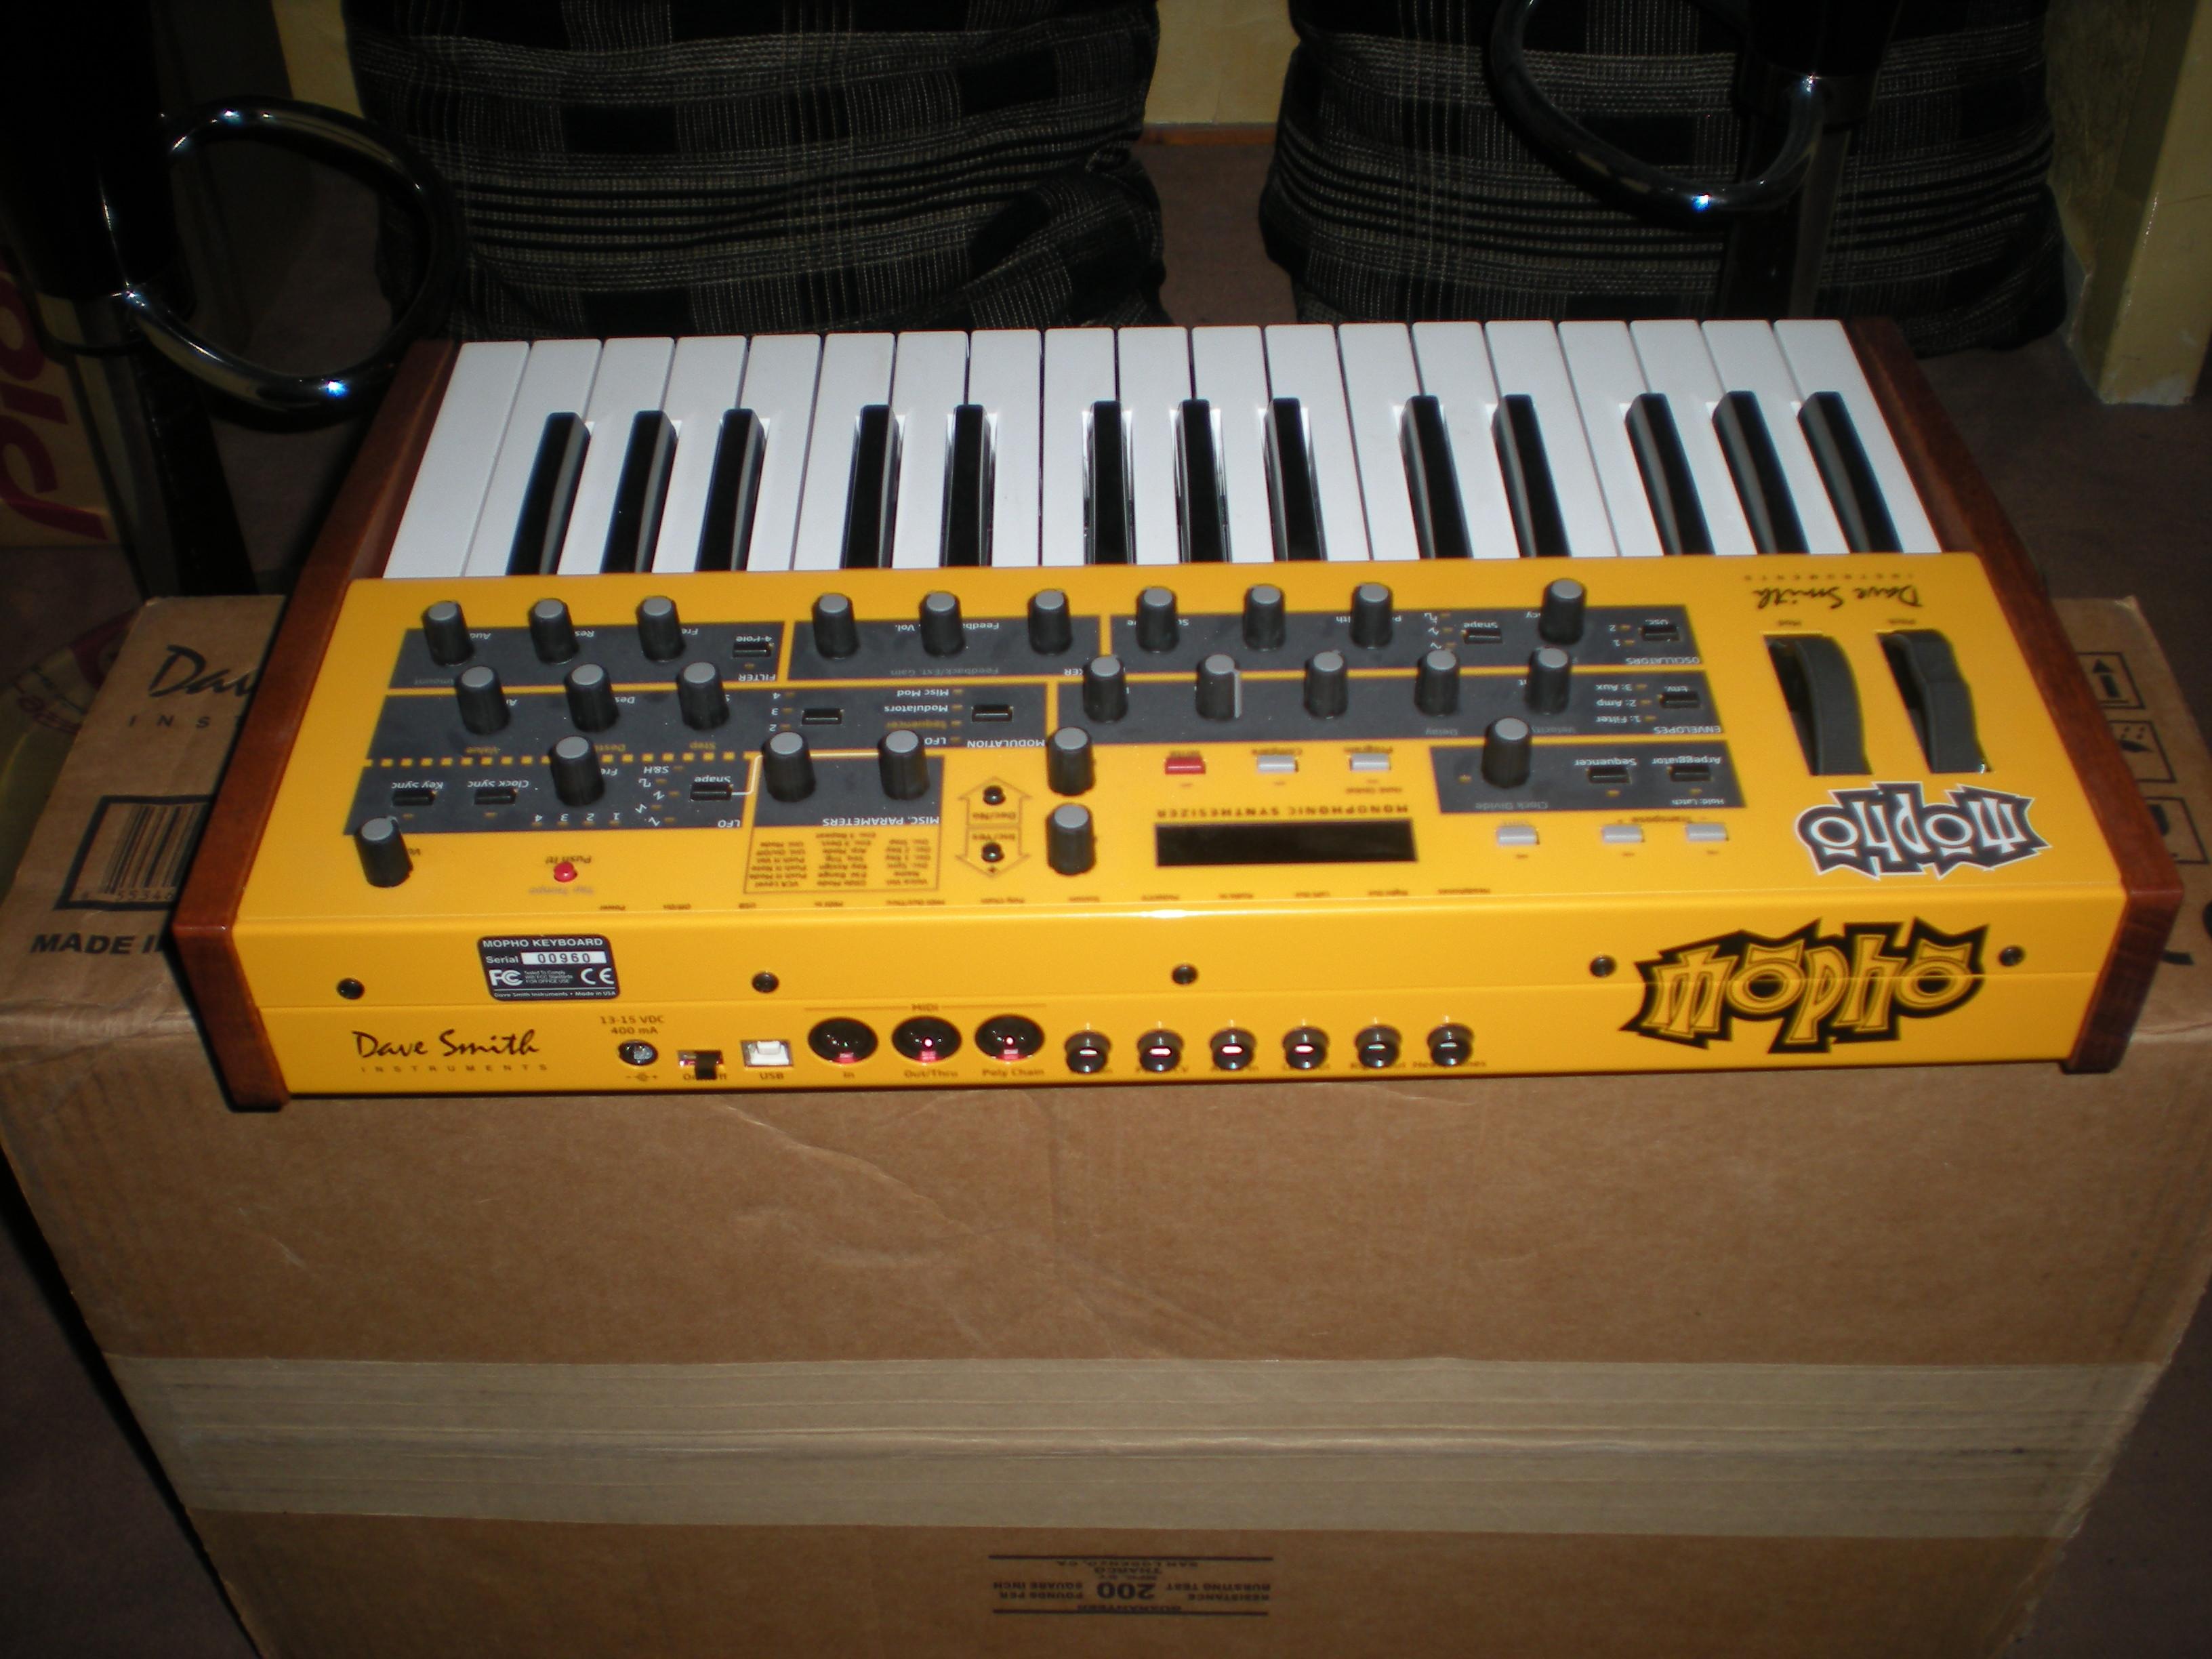 dave smith instruments mopho keyboard image 249321 audiofanzine. Black Bedroom Furniture Sets. Home Design Ideas